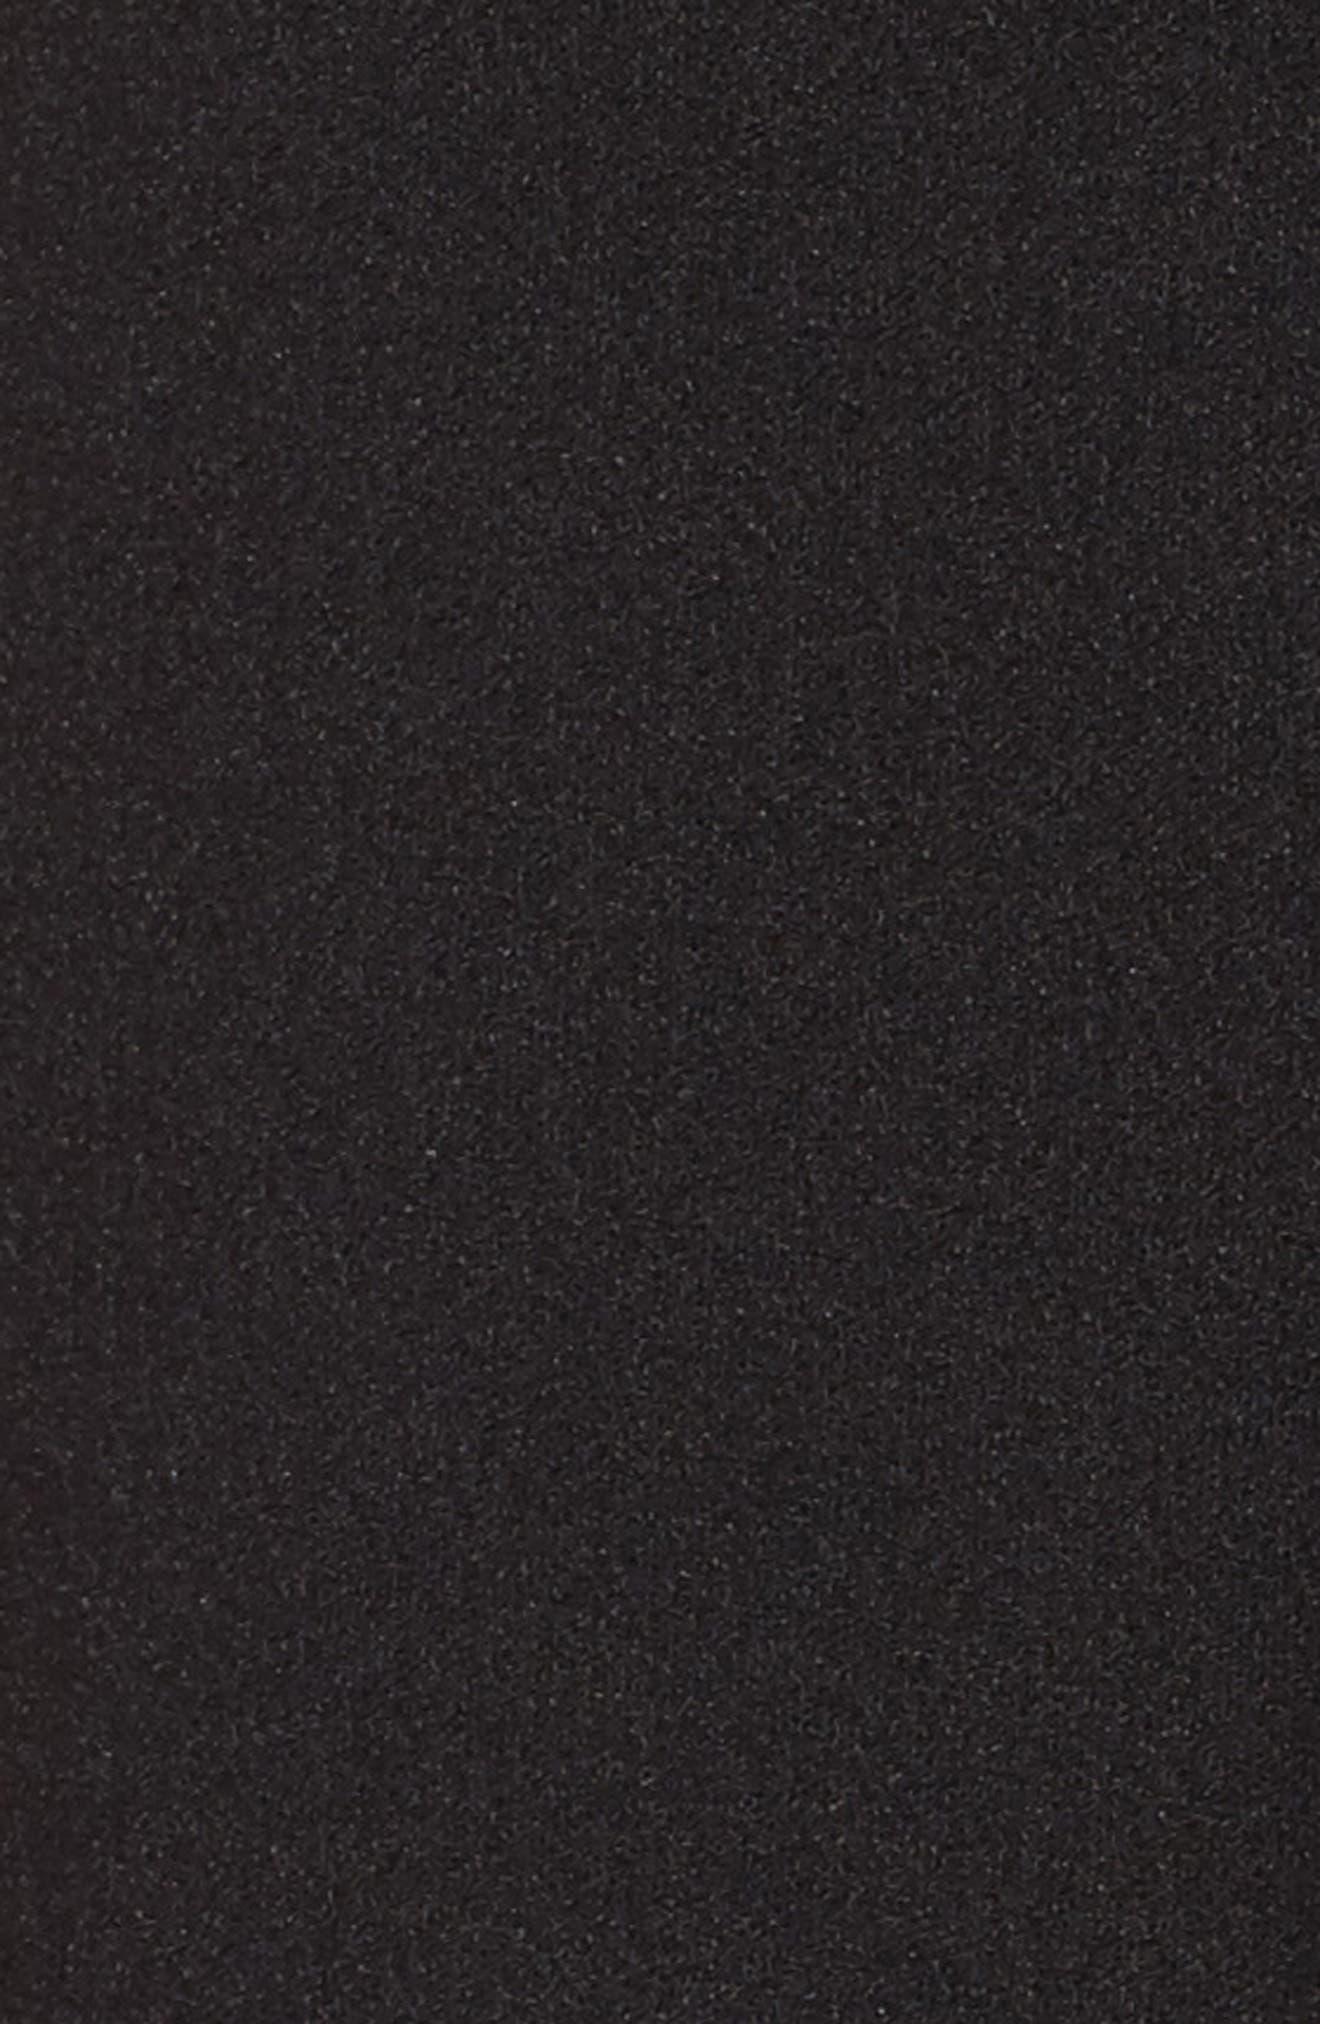 Tie Waist Shorts,                             Alternate thumbnail 5, color,                             Black